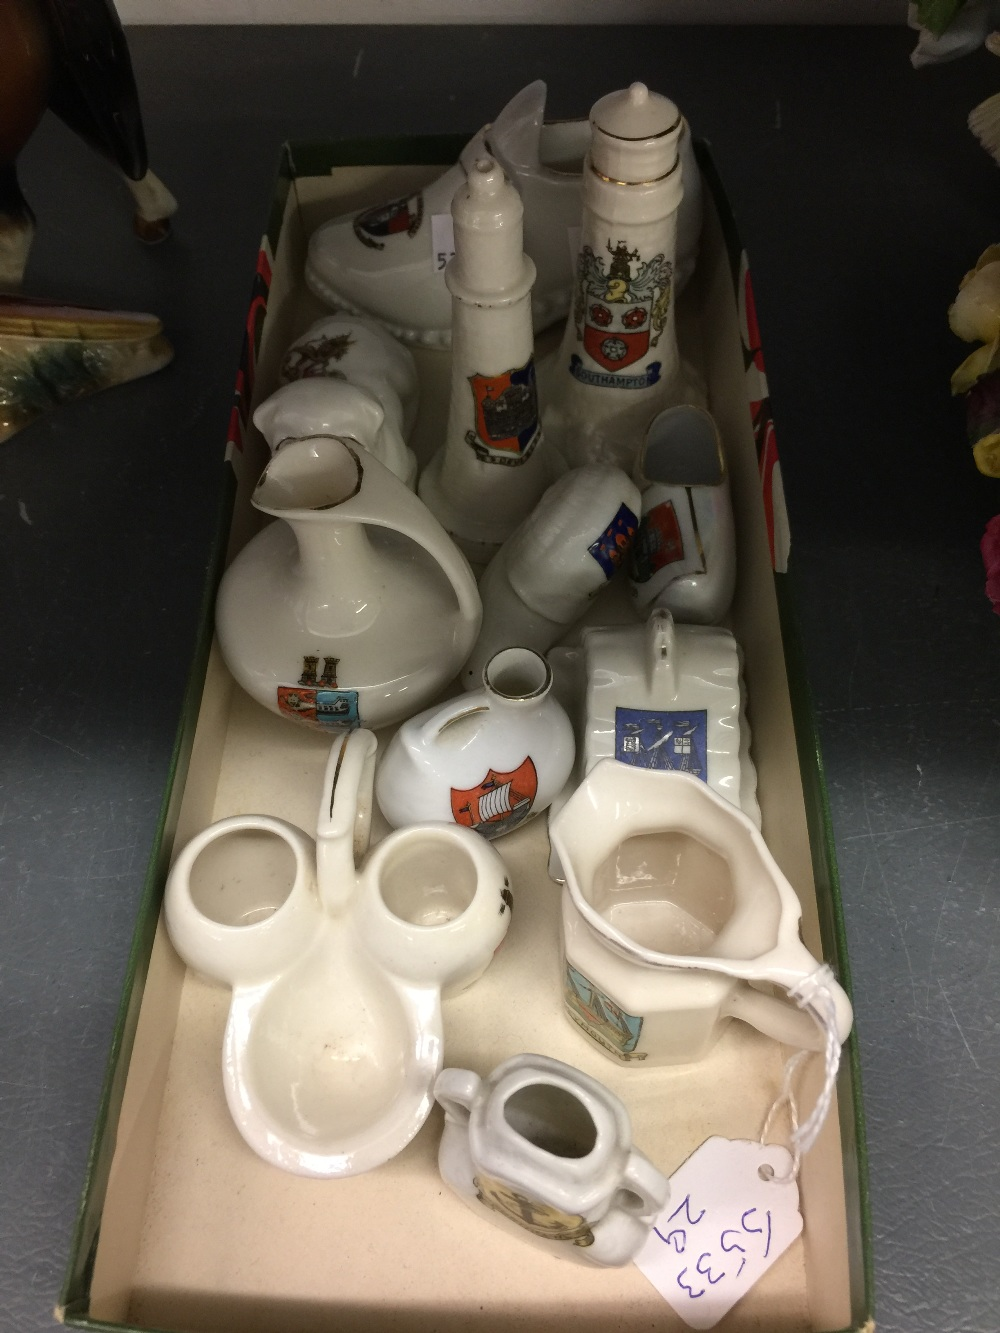 Lot 60 - Crested souvenir ware from Southampton, Deal, Newbury, Portland,etc. (11)